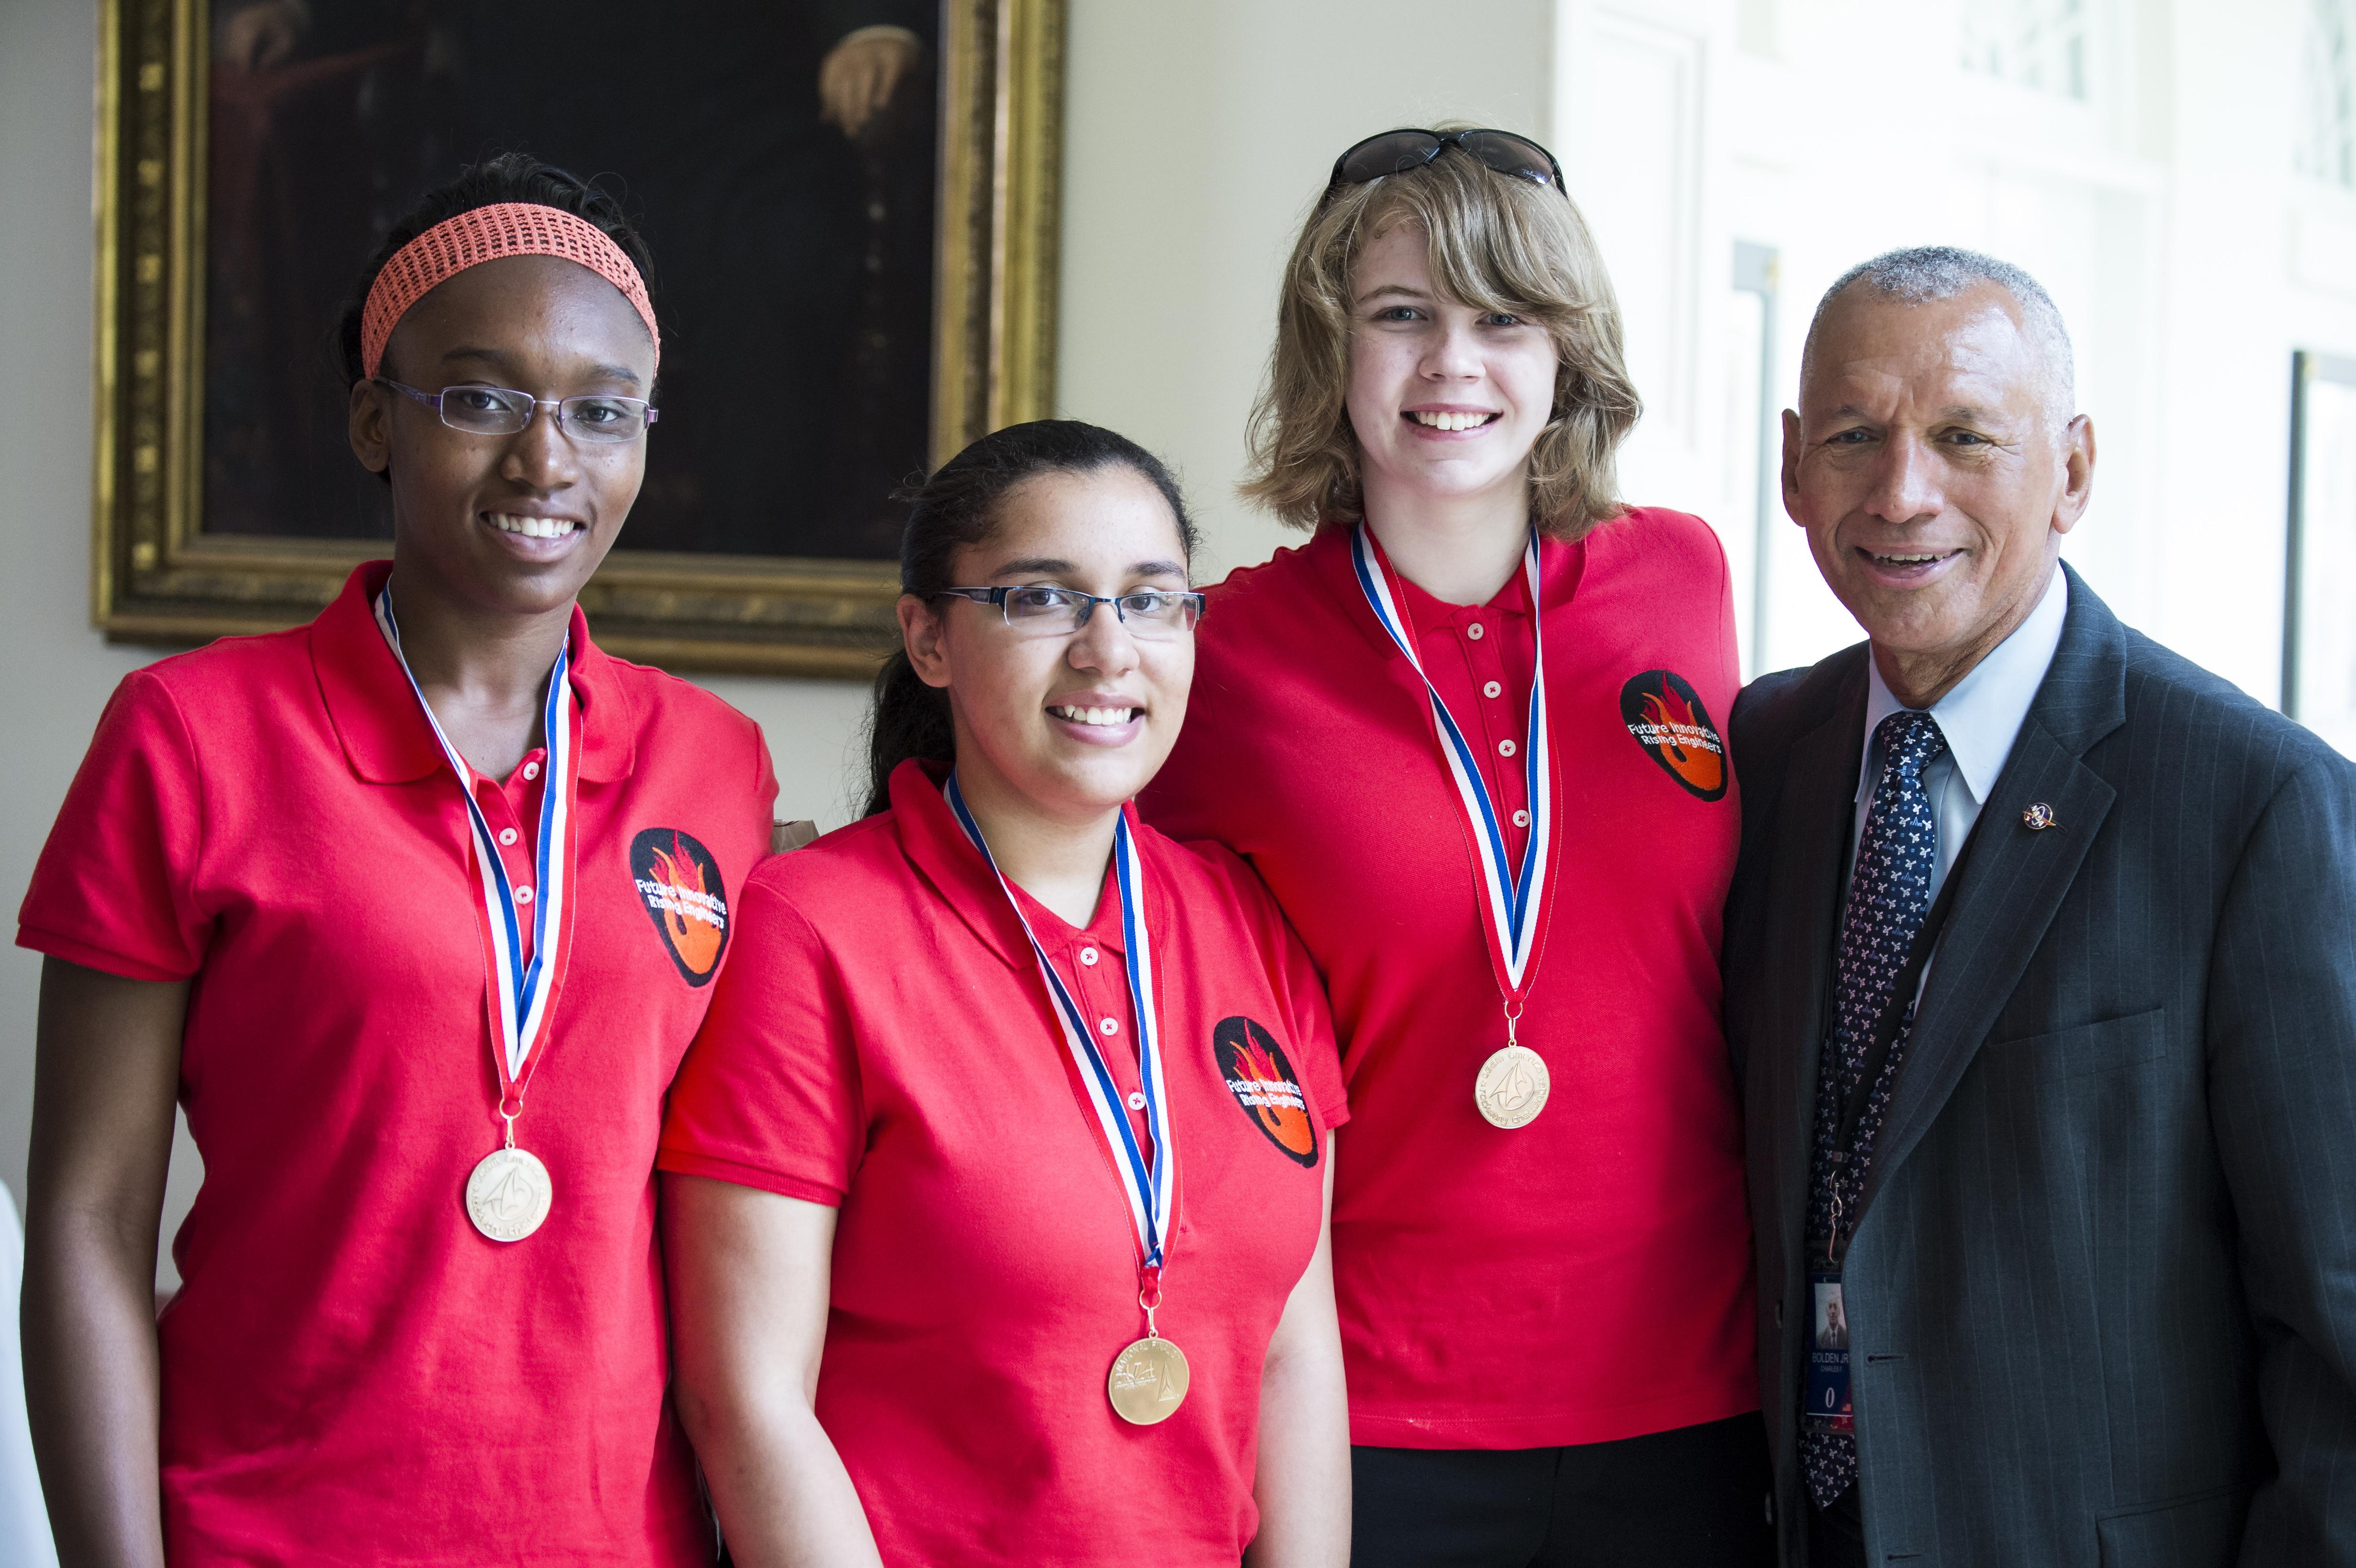 All-Girl Student Rocket Team Visits White House